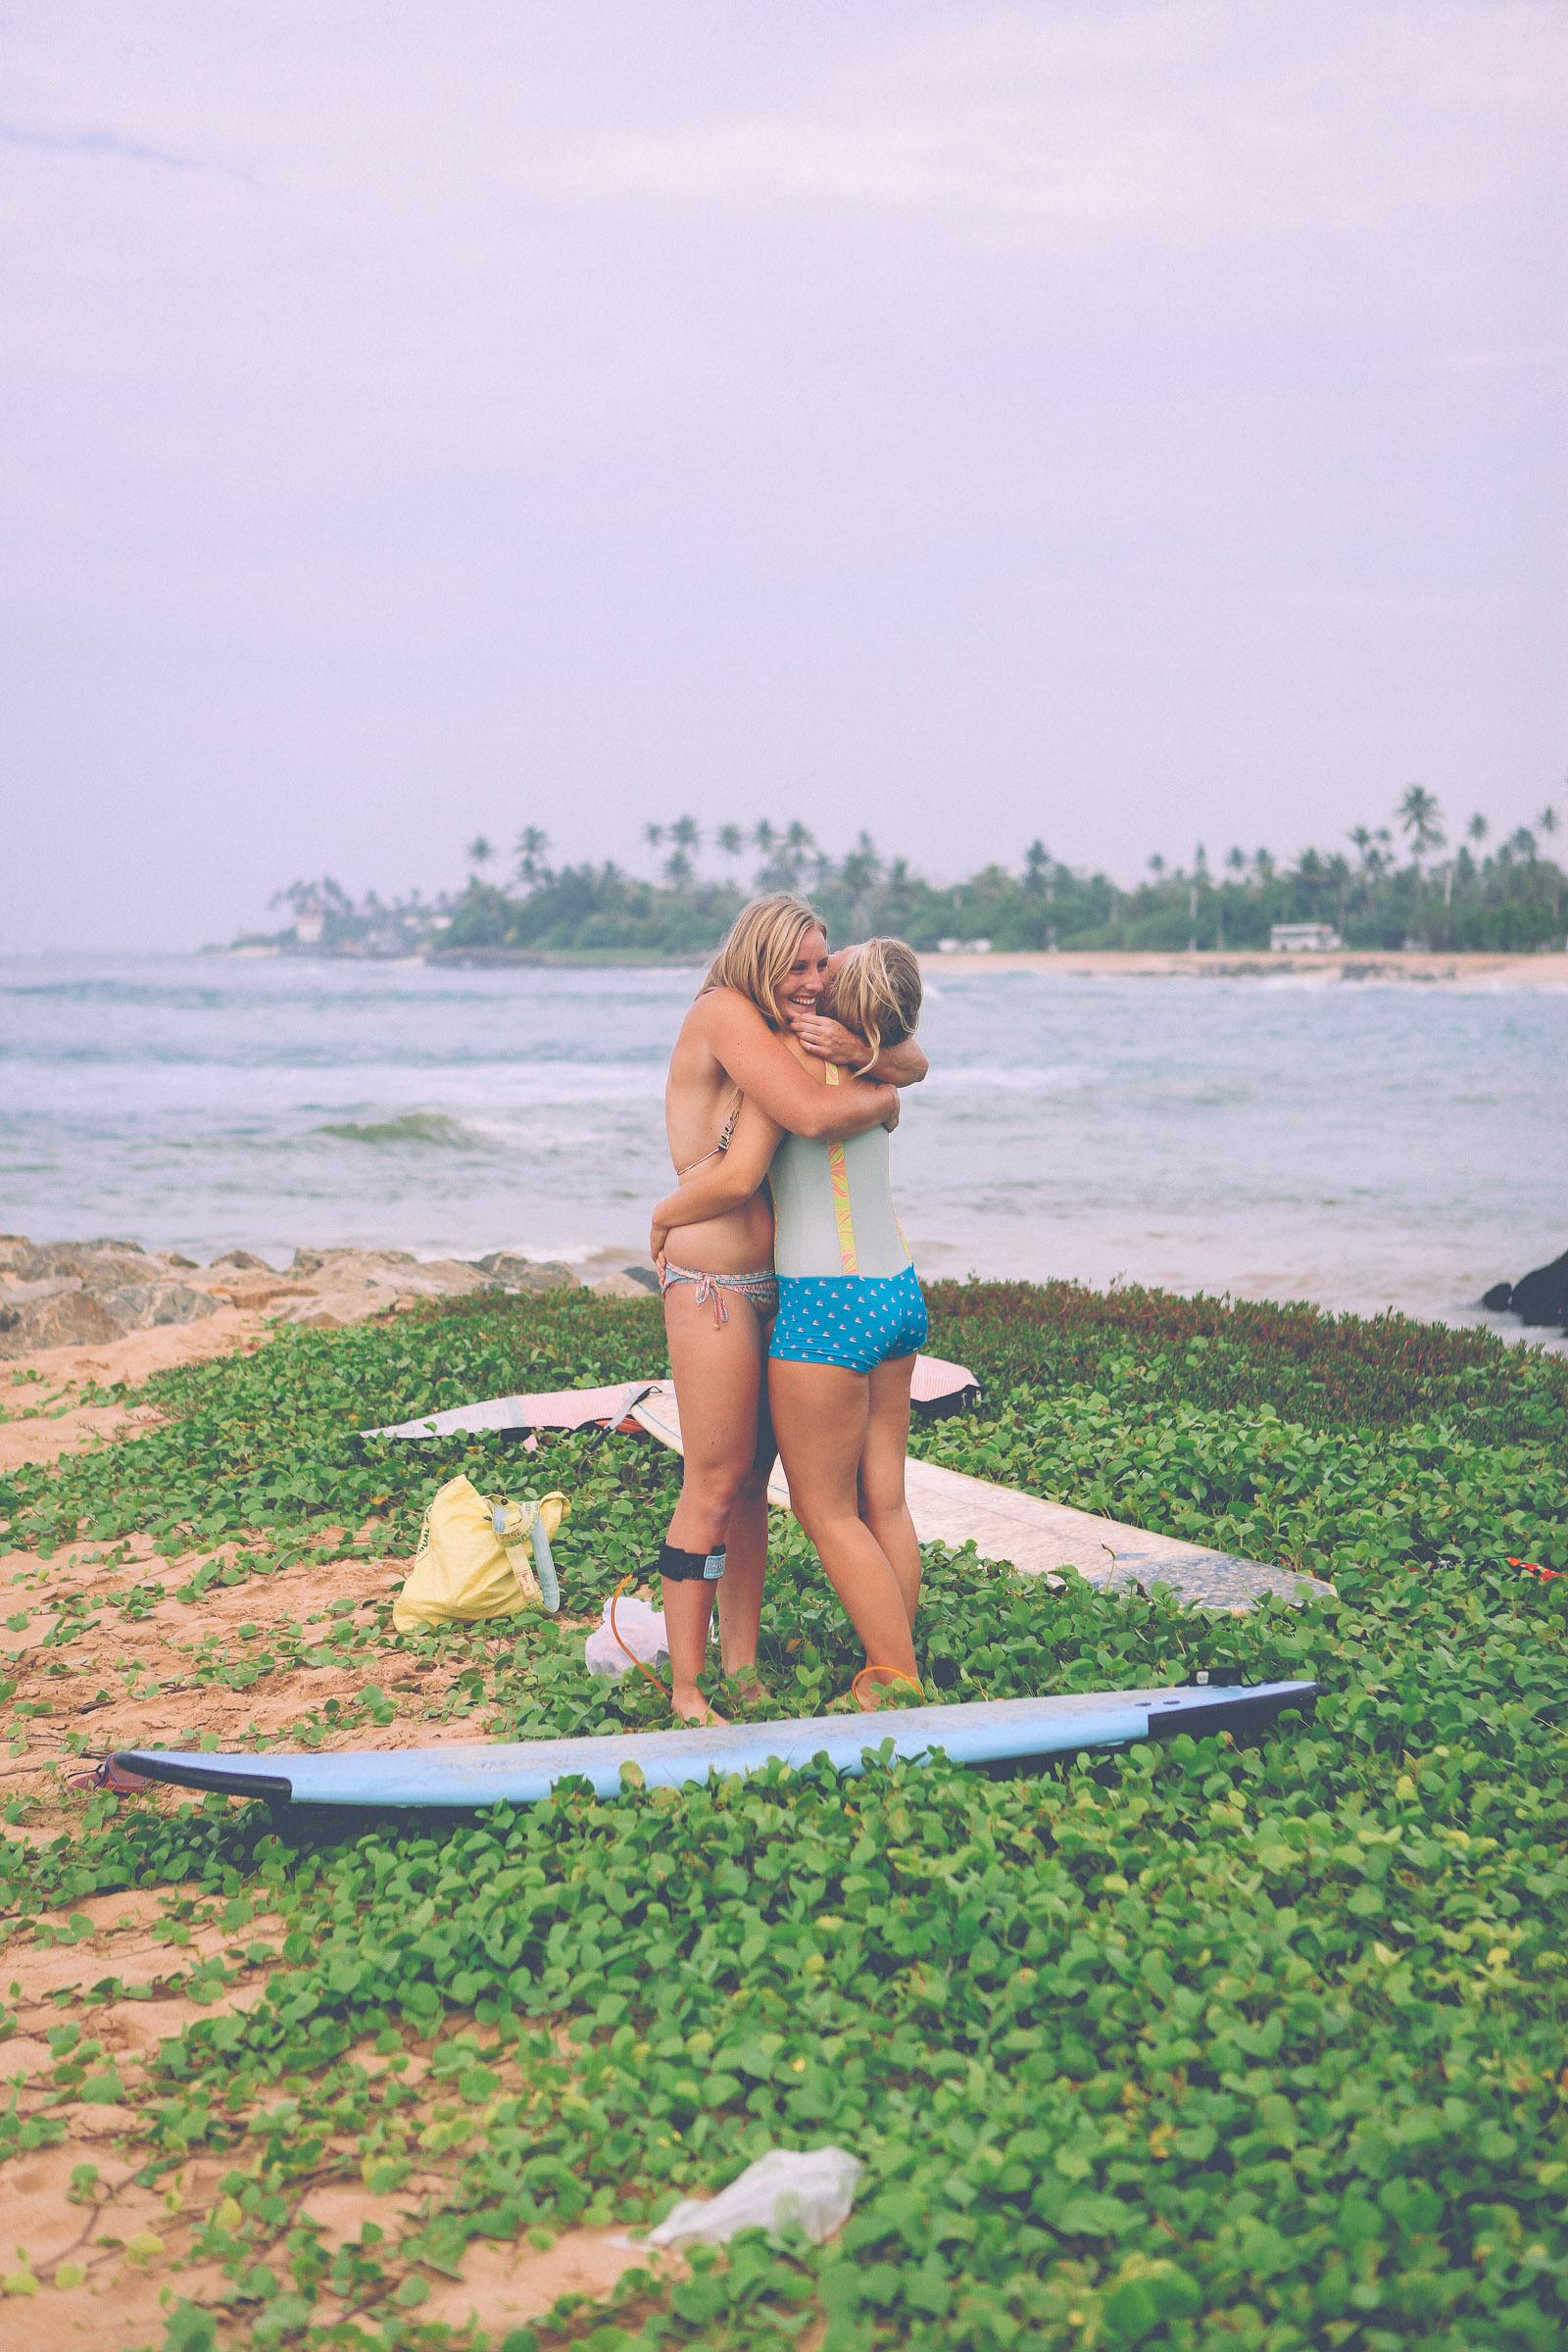 Sri Lanka-Lazy Left-Rams-Midigama-Surfing-Surf-Wave-Pointbreak-Longboard-Sunshinestories-IMG_6844